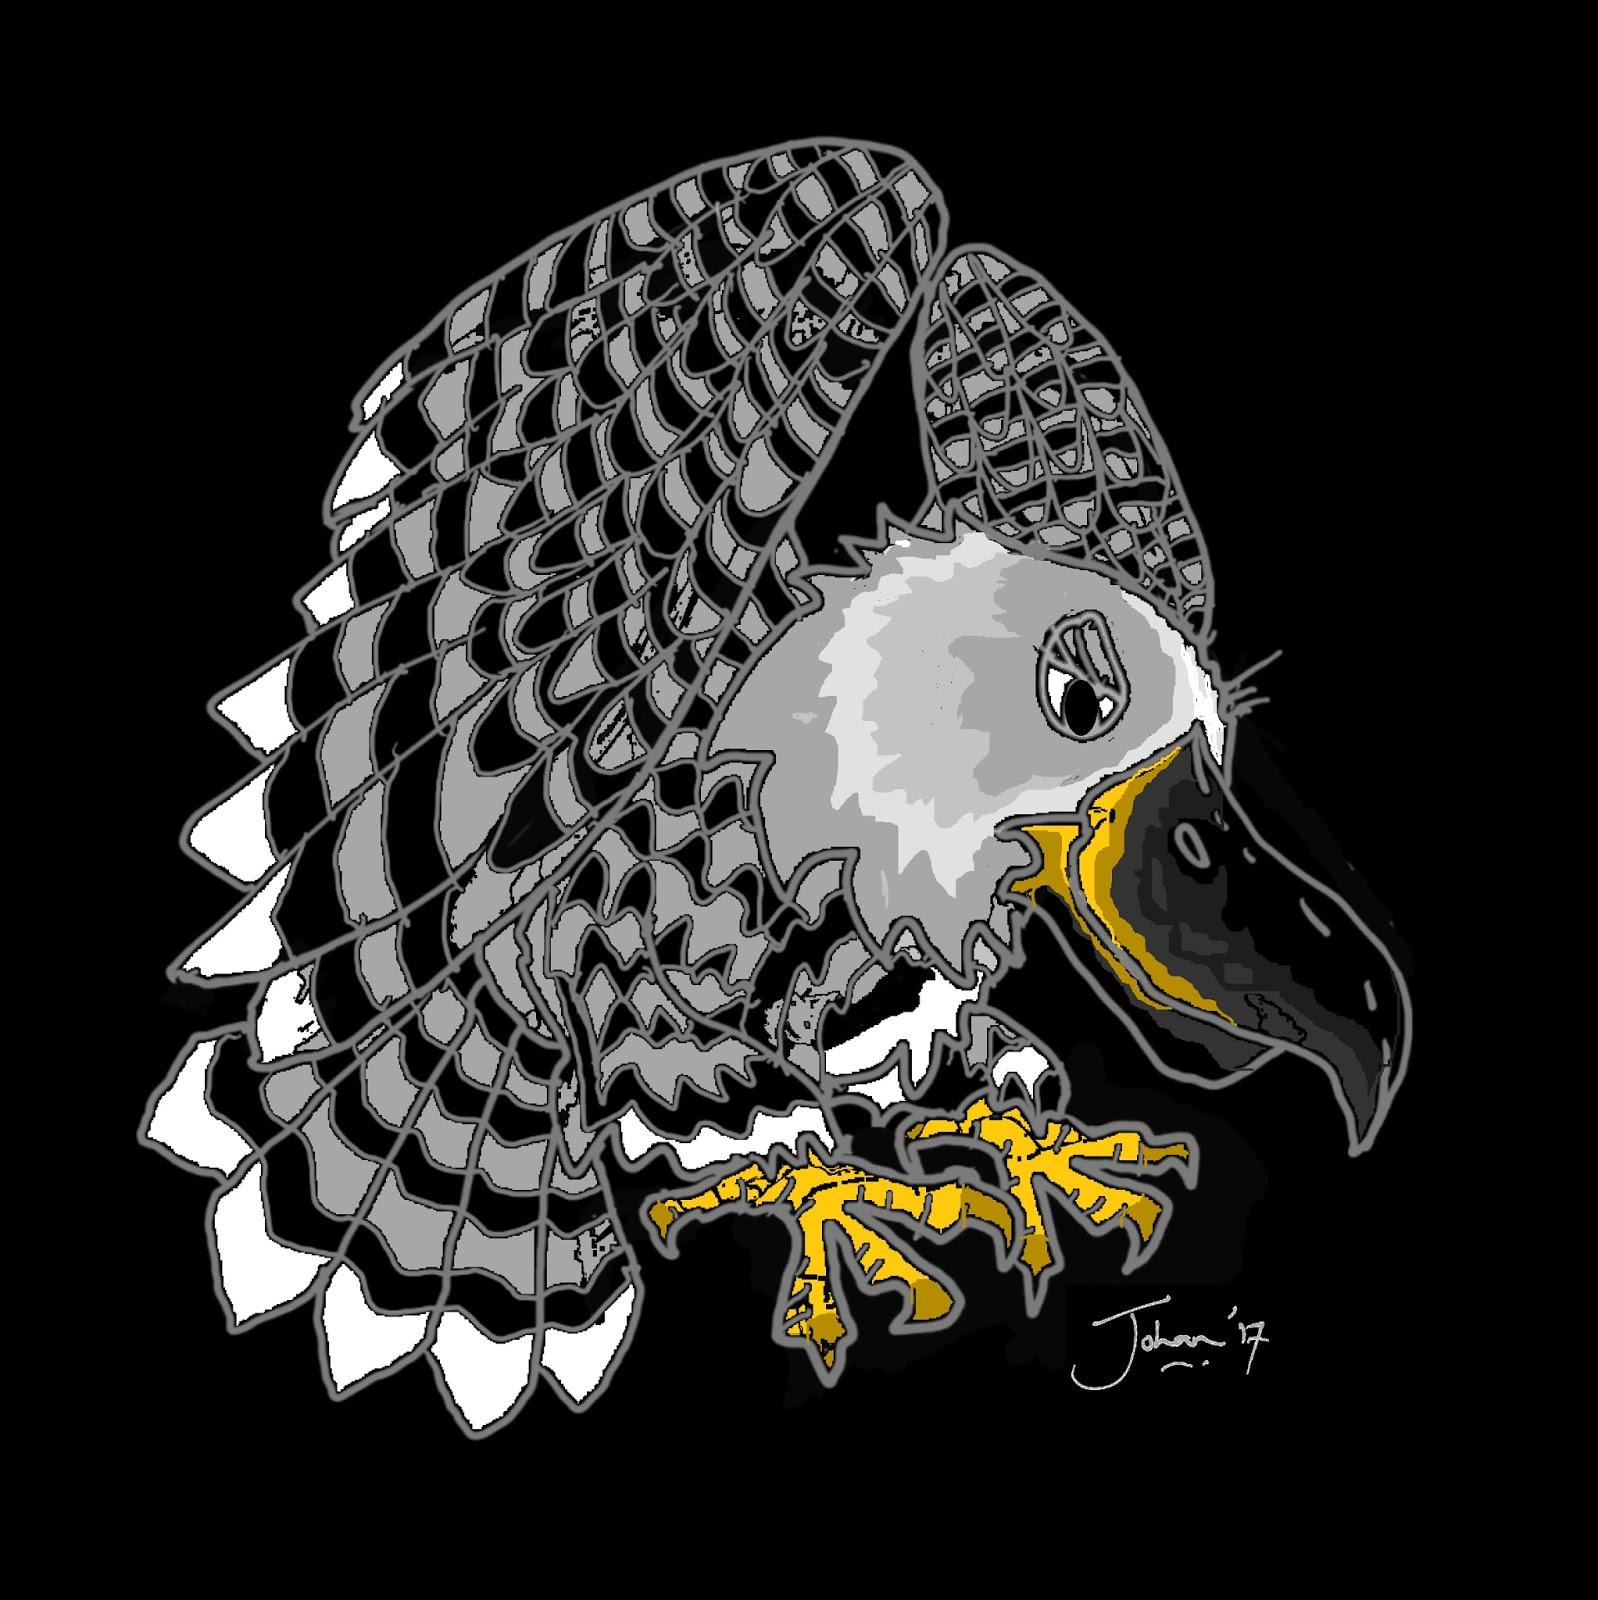 BUANASENI: CARICREATURES III BLACK * WHITE